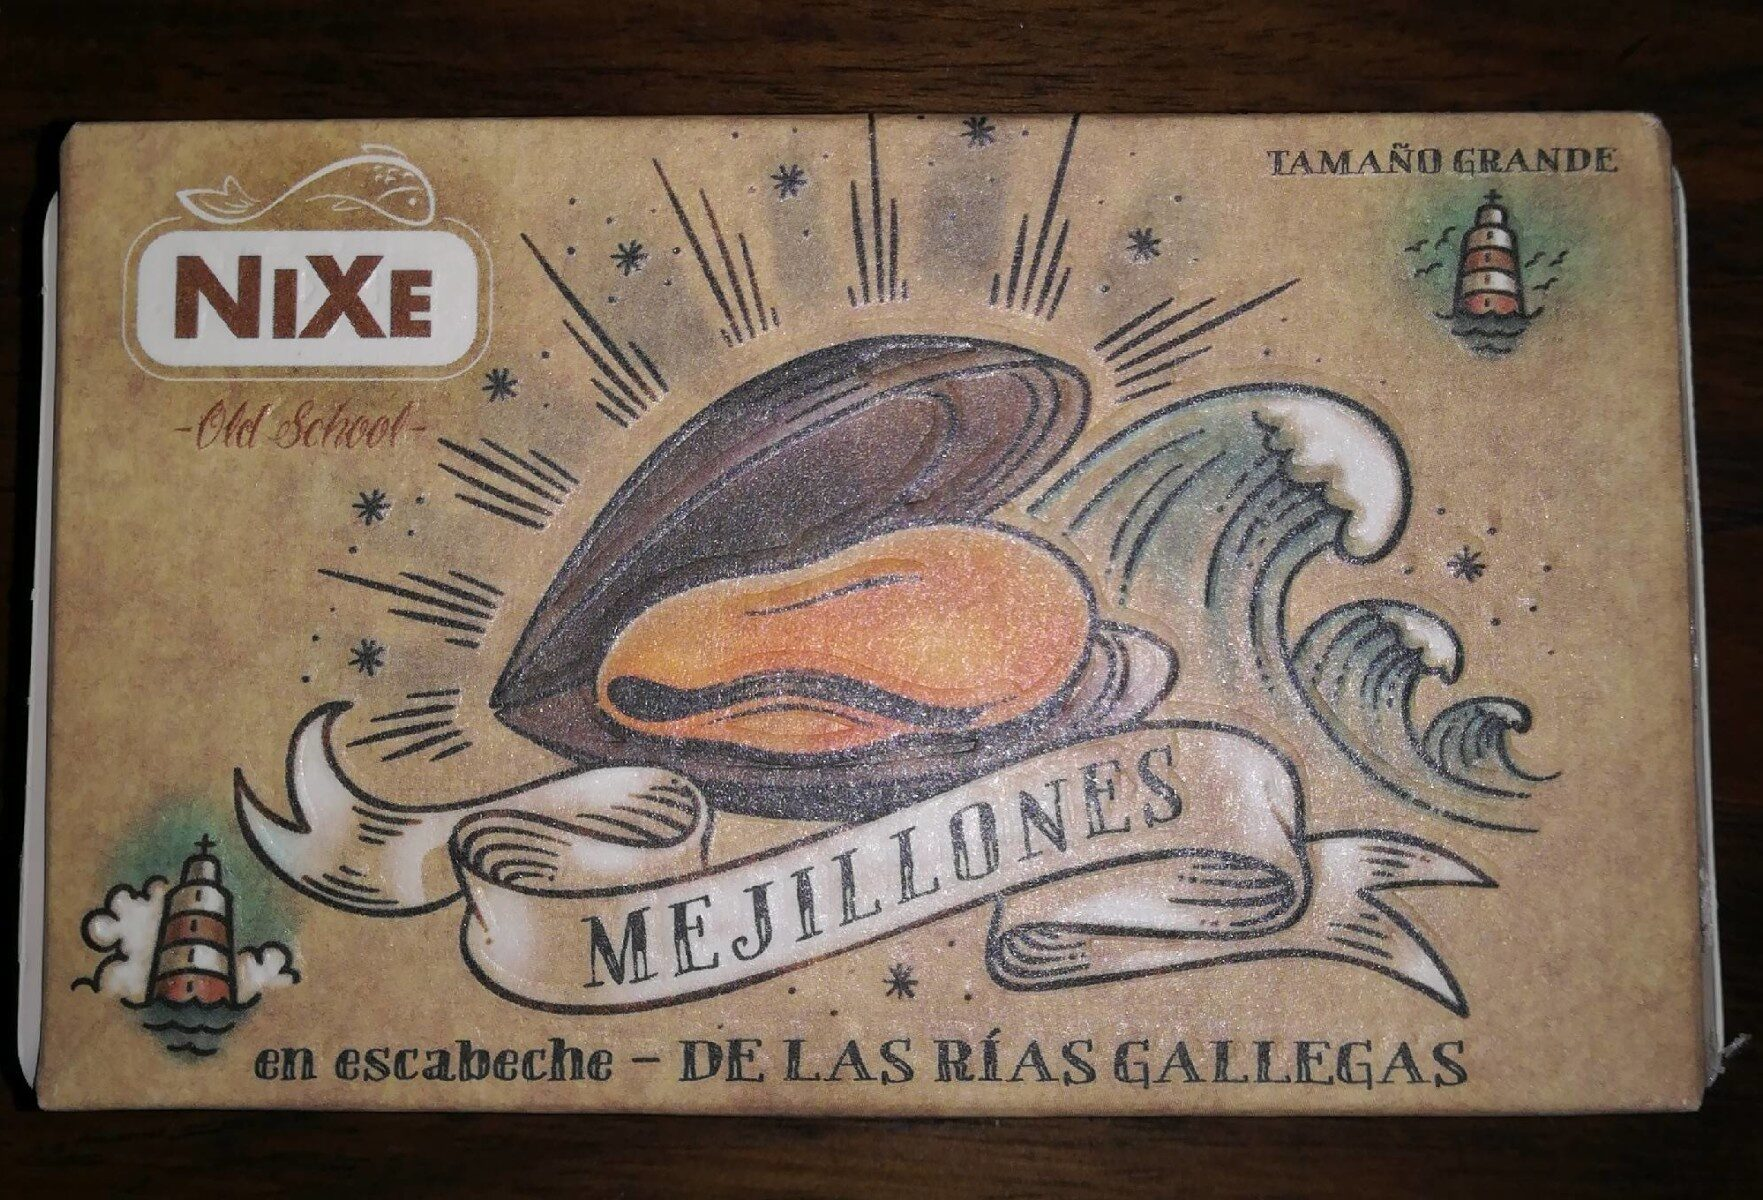 Mejillones - Product